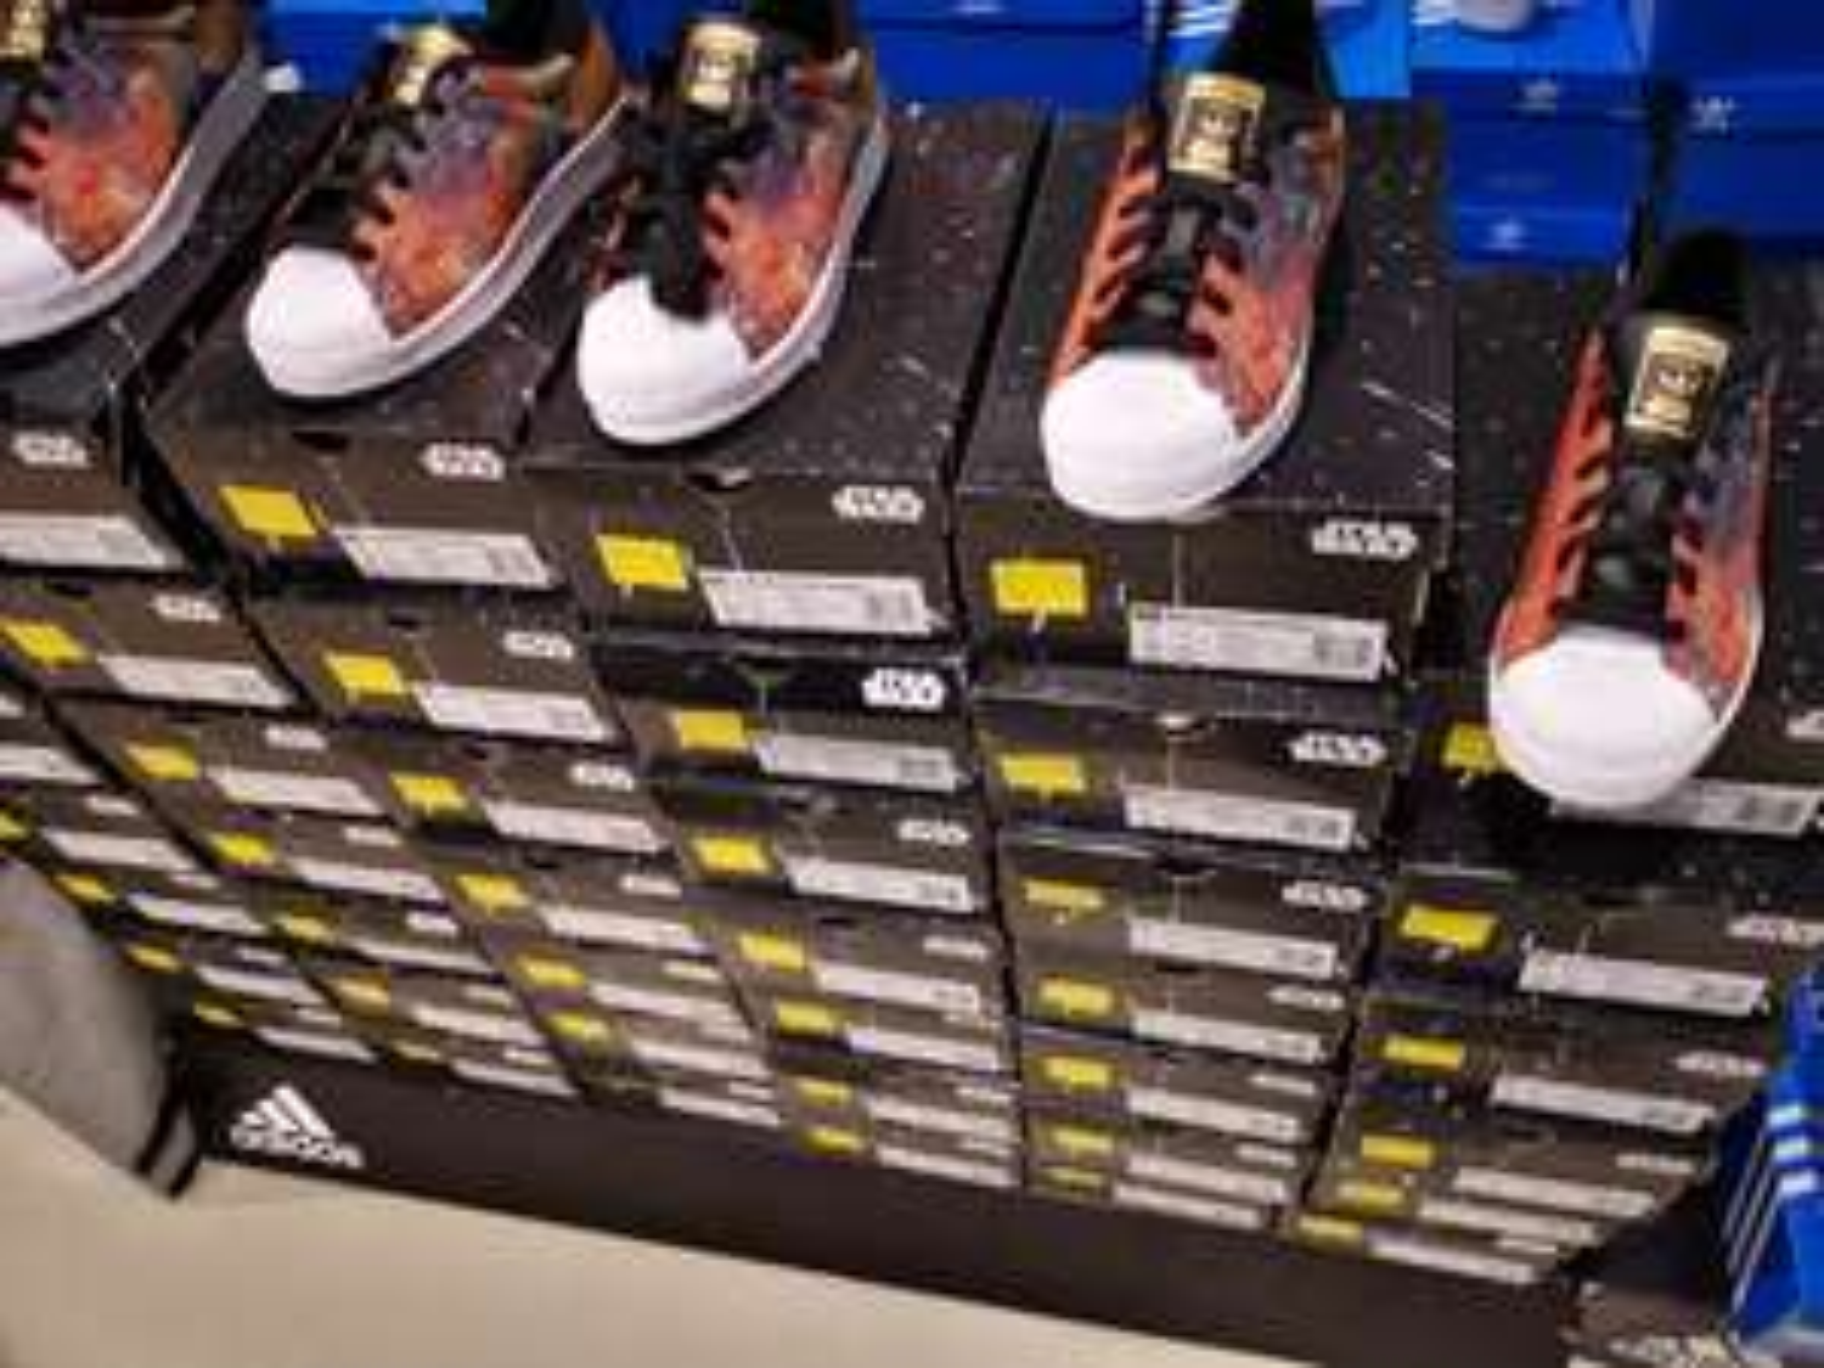 Paire de chaussures Superstar star wars - Channel Outlet Calais (62)